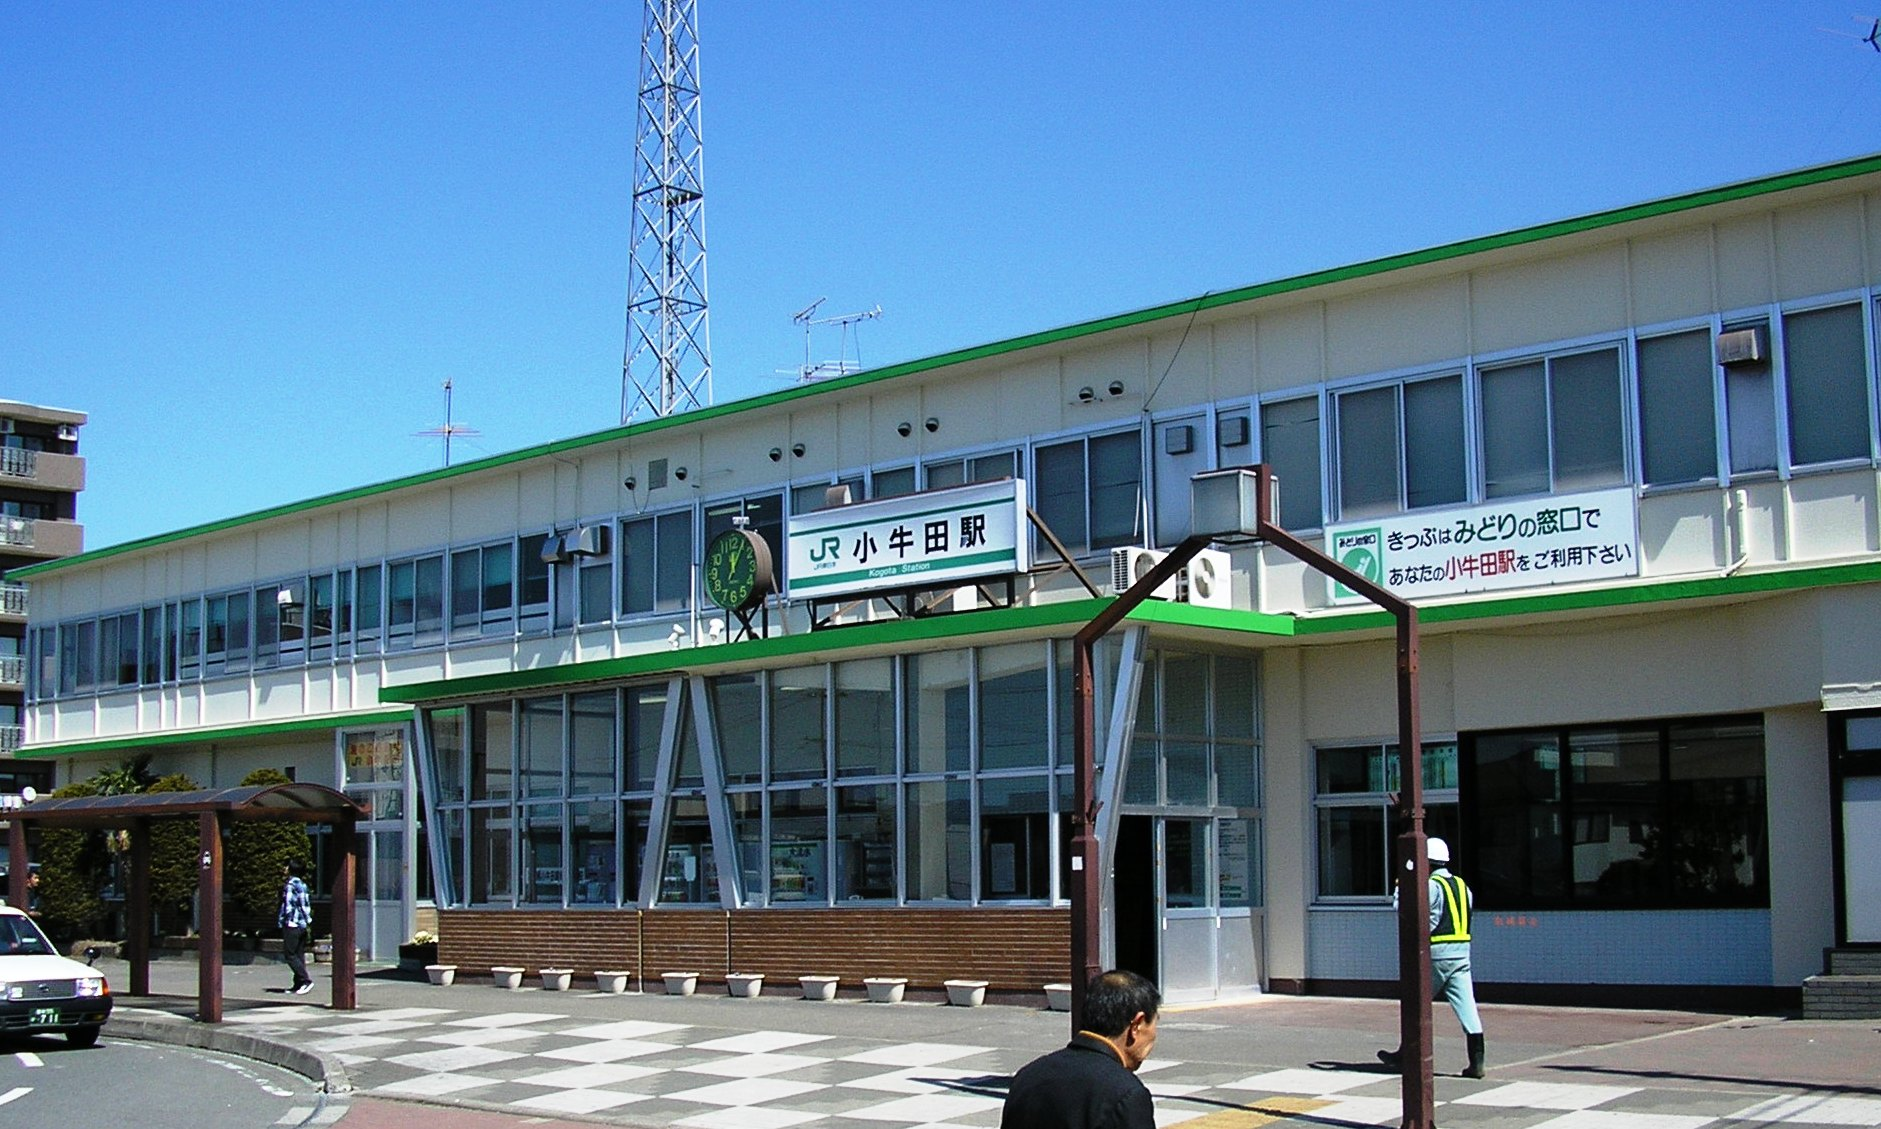 https://upload.wikimedia.org/wikipedia/commons/b/bd/Kogota_Rail_Station.jpg